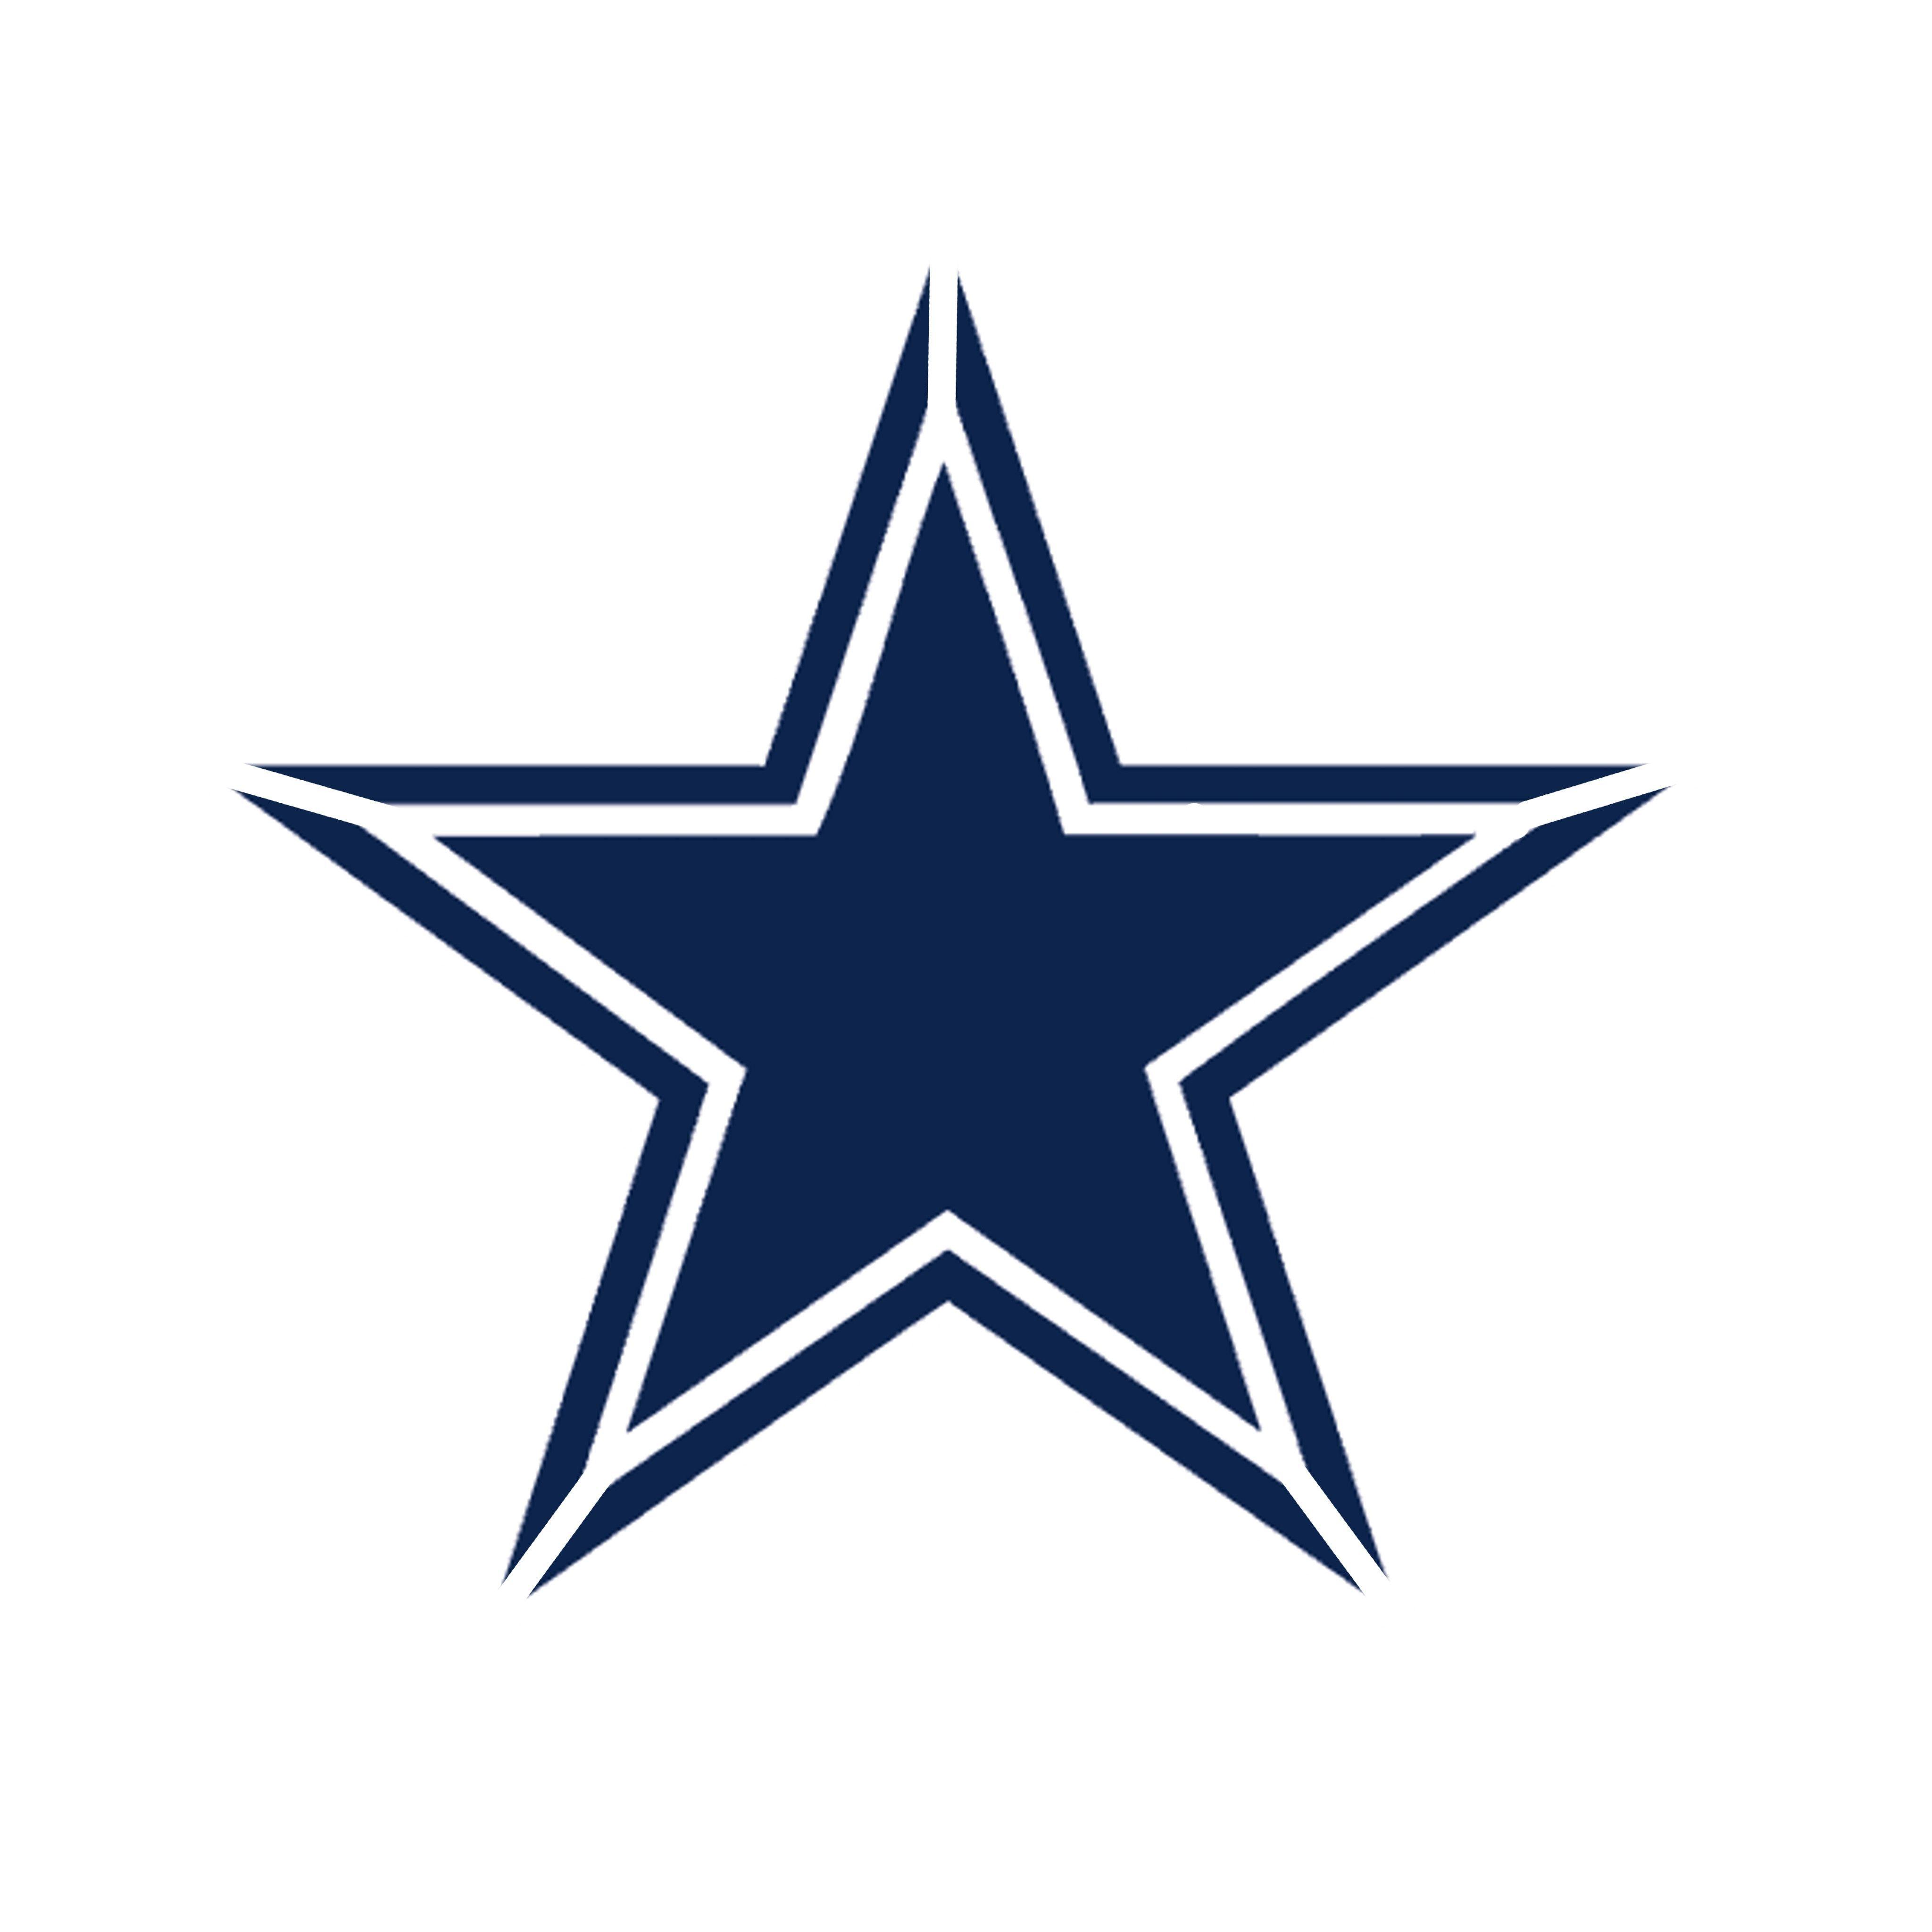 Dallas Cowboy Font And Logo Stencil 10 Mil Reusable Patterns Dallas Cowboys Logo Dallas Cowboys Star Dallas Cowboys